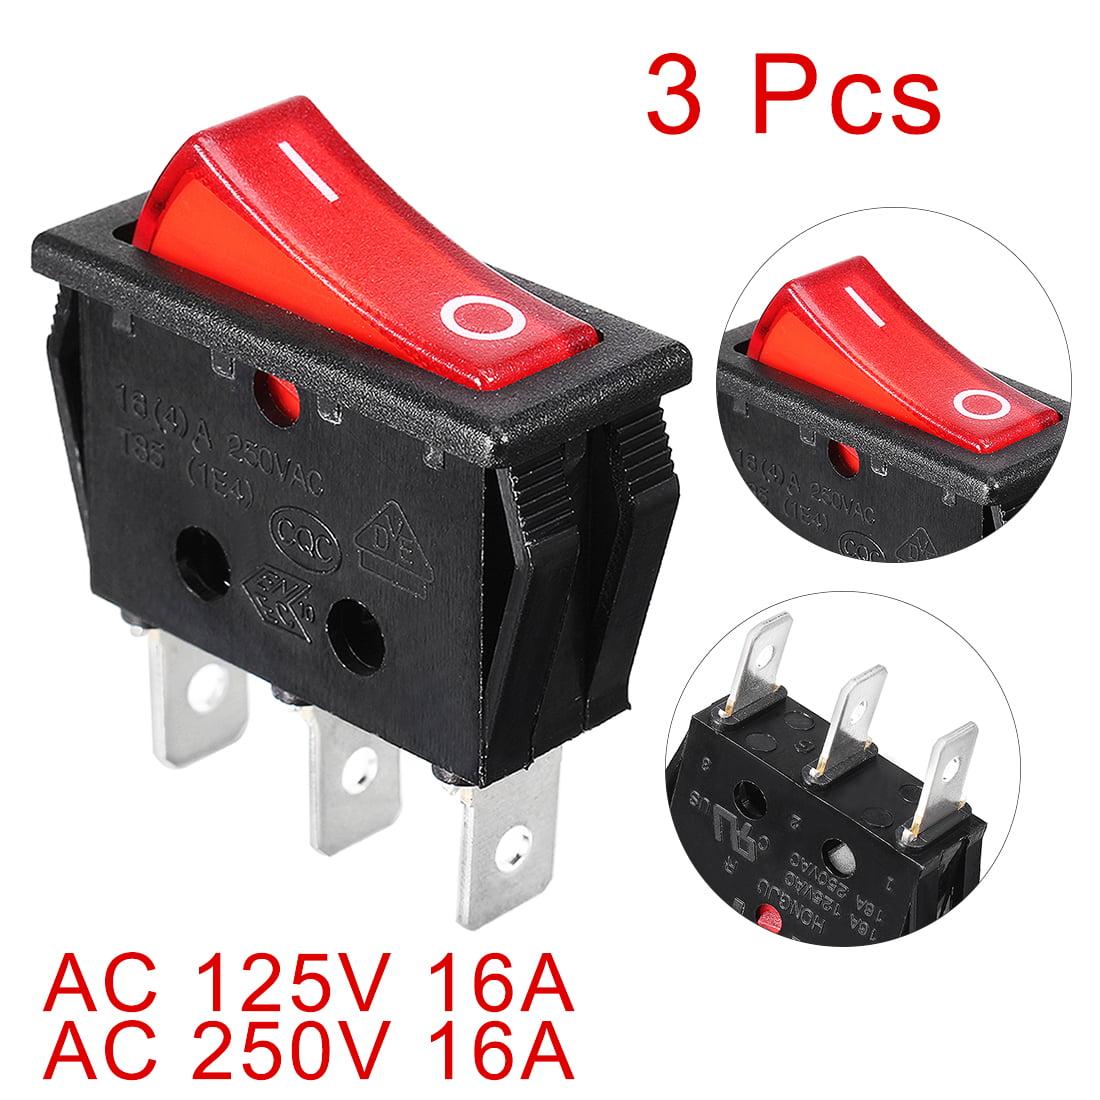 3 Pcs Red Press Button SPST 3 Terminals Boat Rocker Switch 16A 250VAC - image 5 de 7